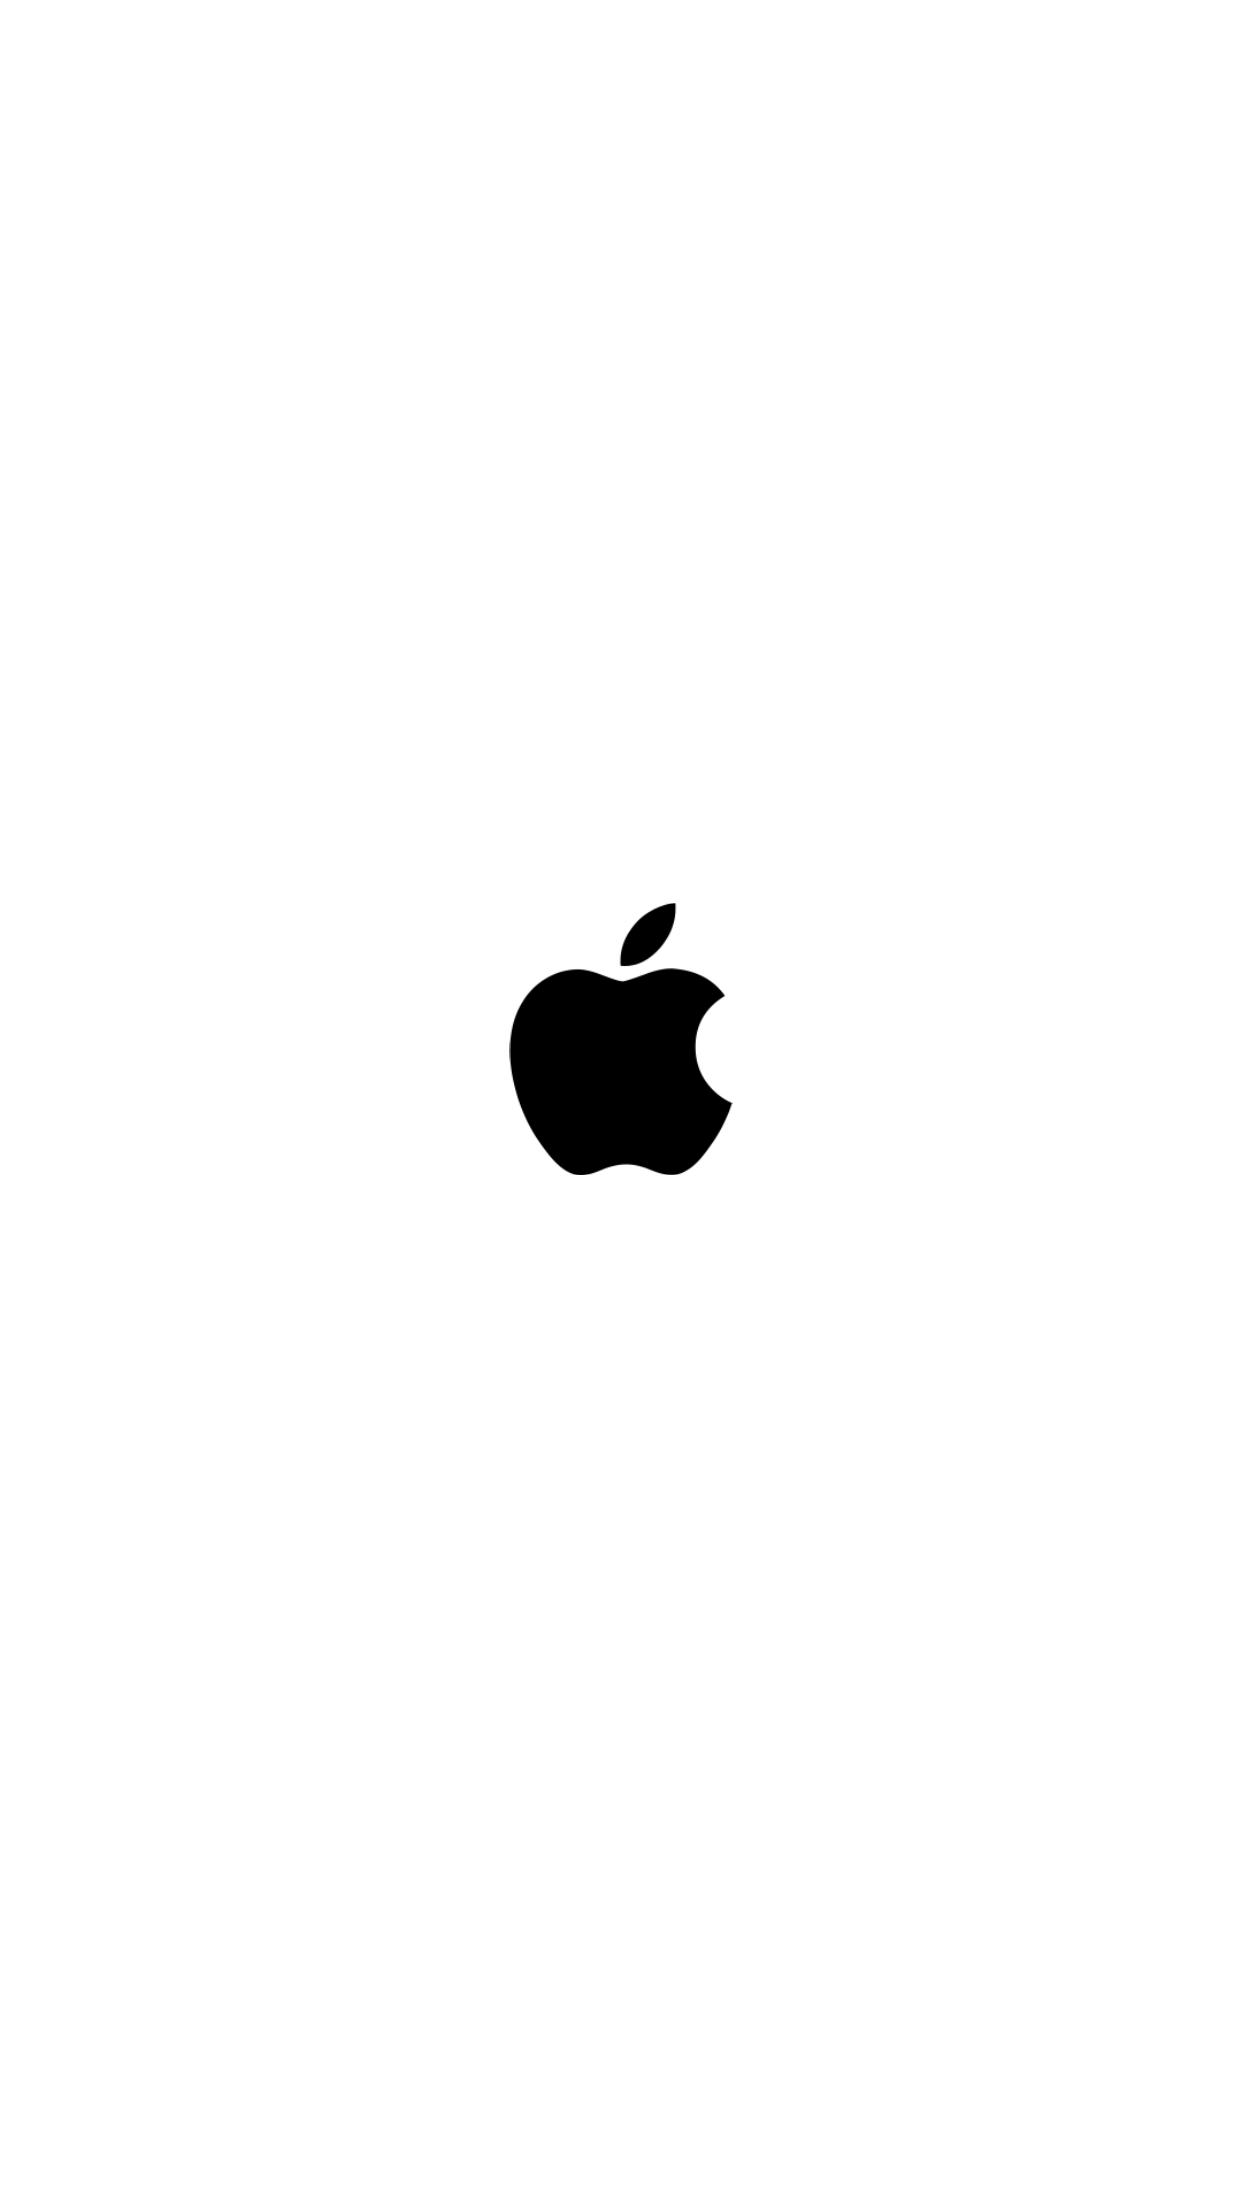 Sergio Andrés Photografie Apple Logo Nel 2019 Sfondi Per Iphone